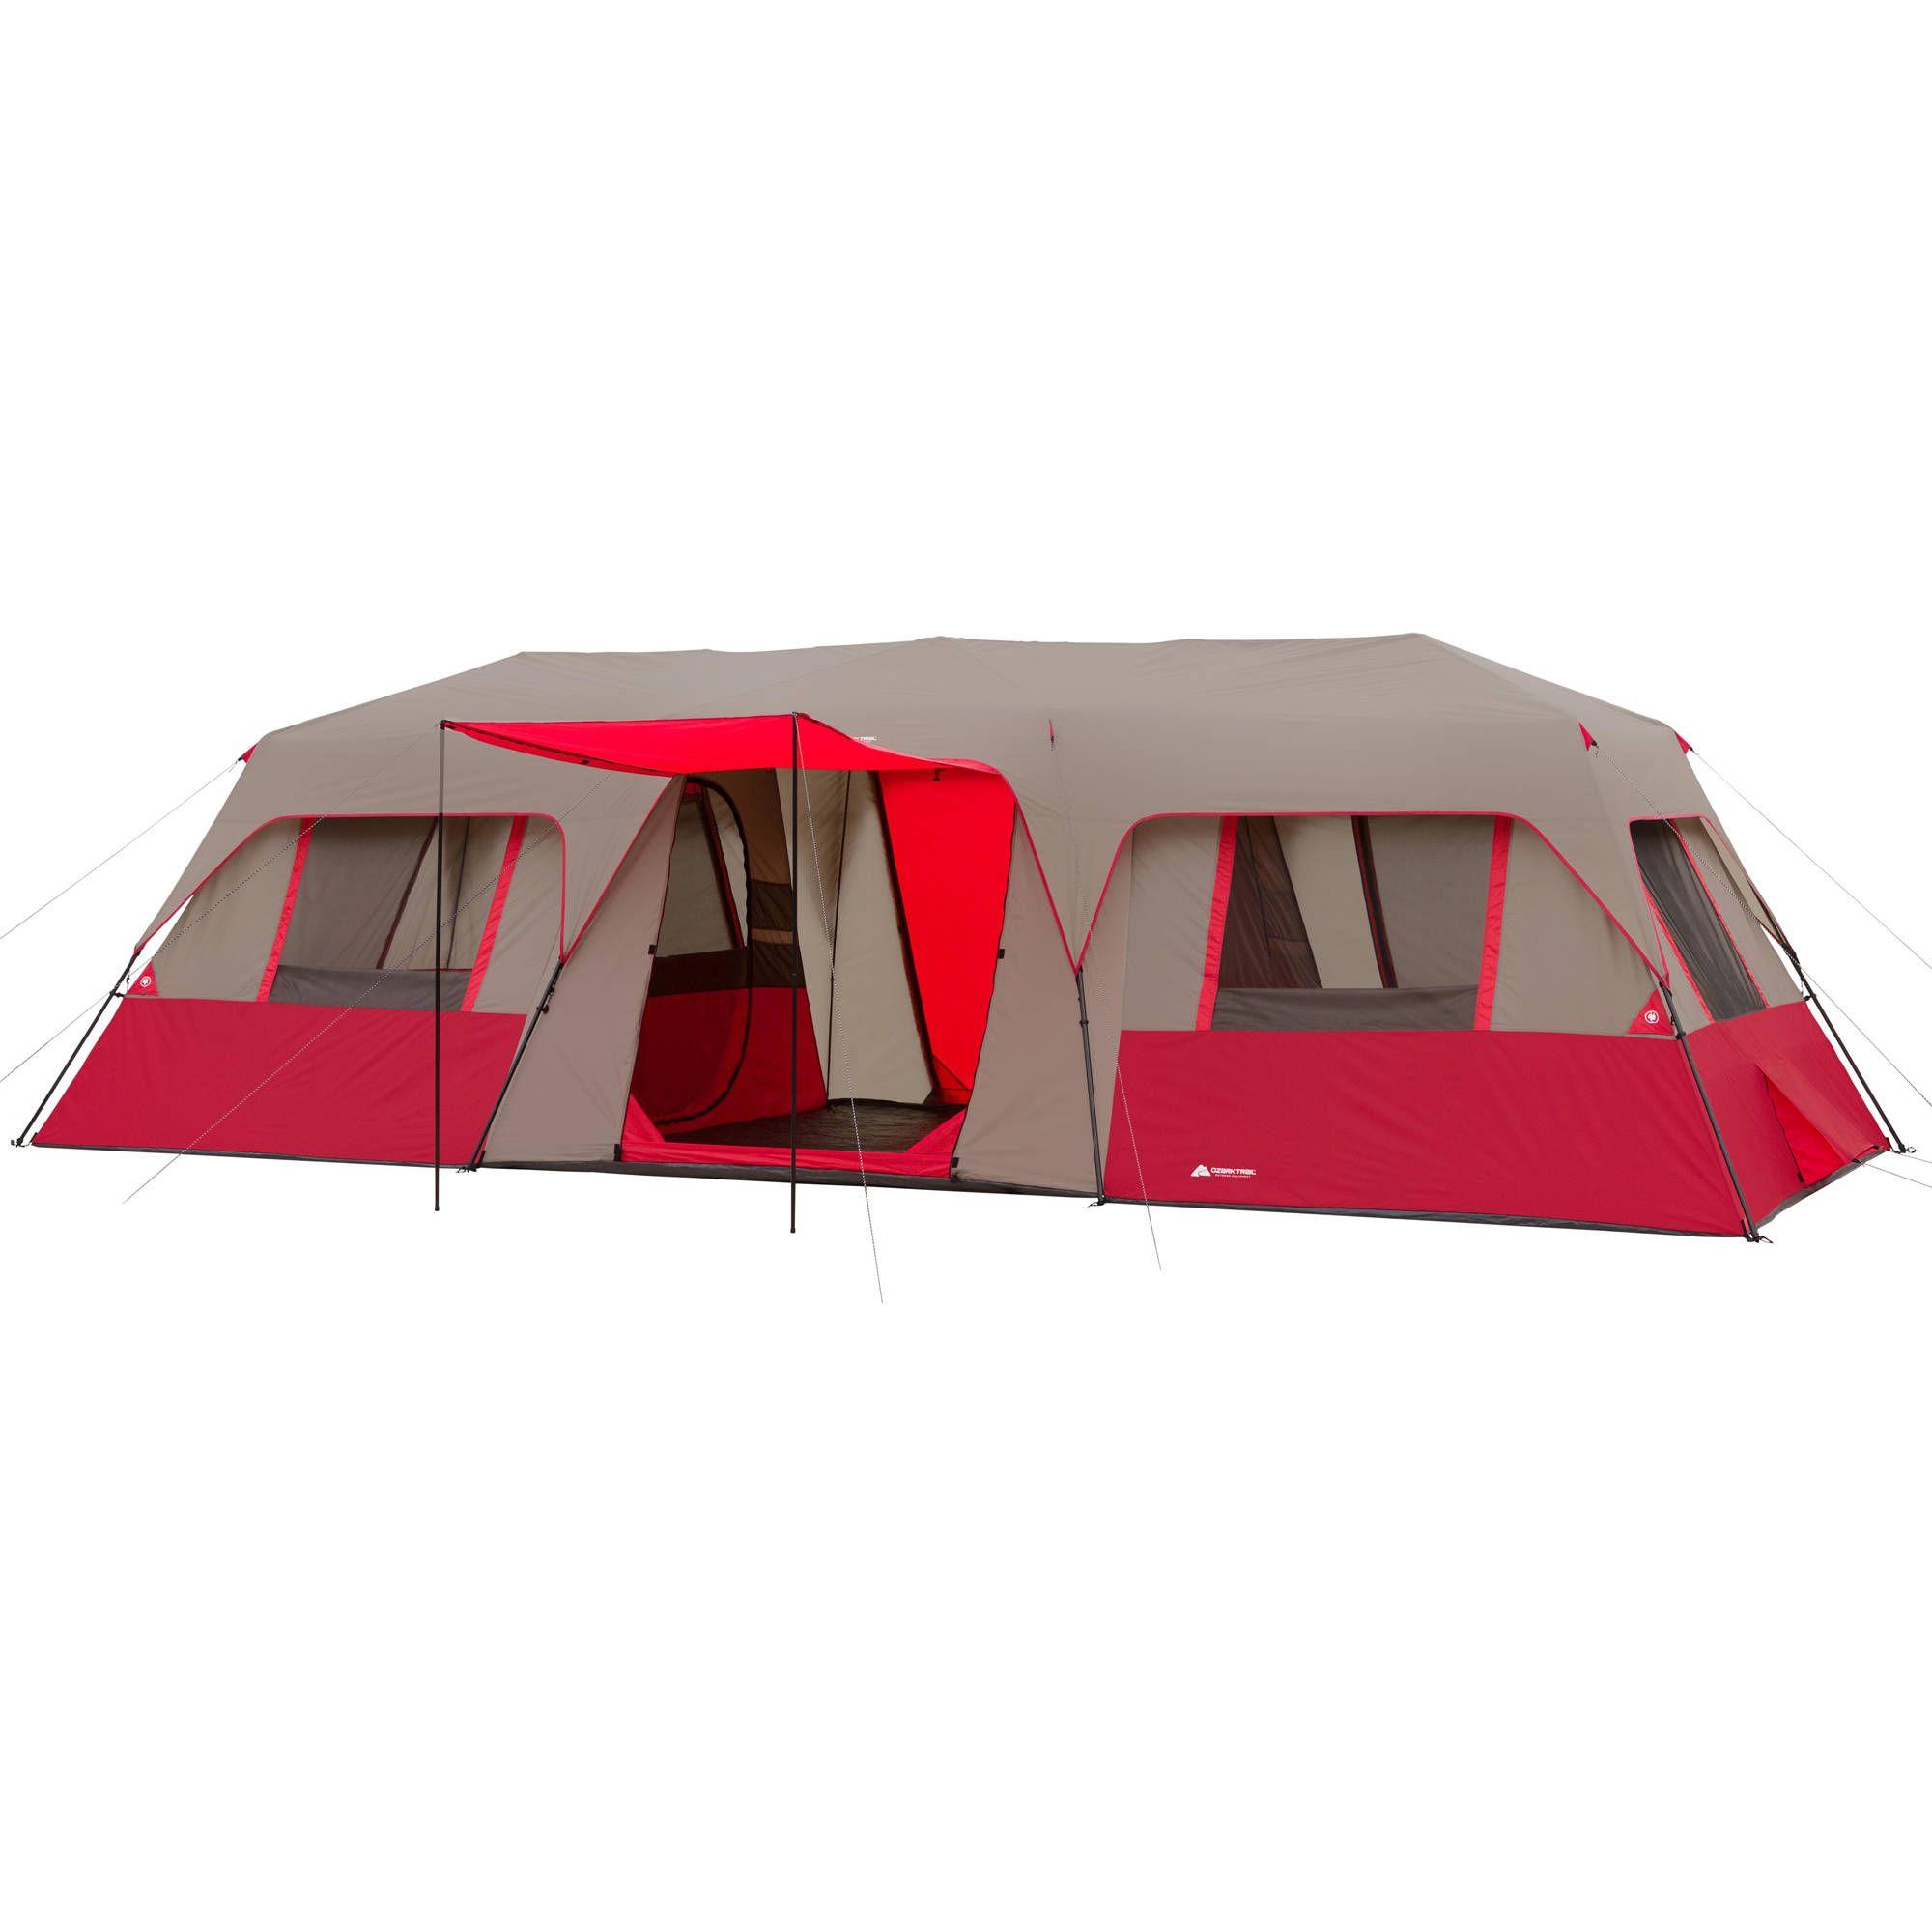 Buy Ozark Trail 15 Person 3 Room Split Plan Instant Cabin Tent At